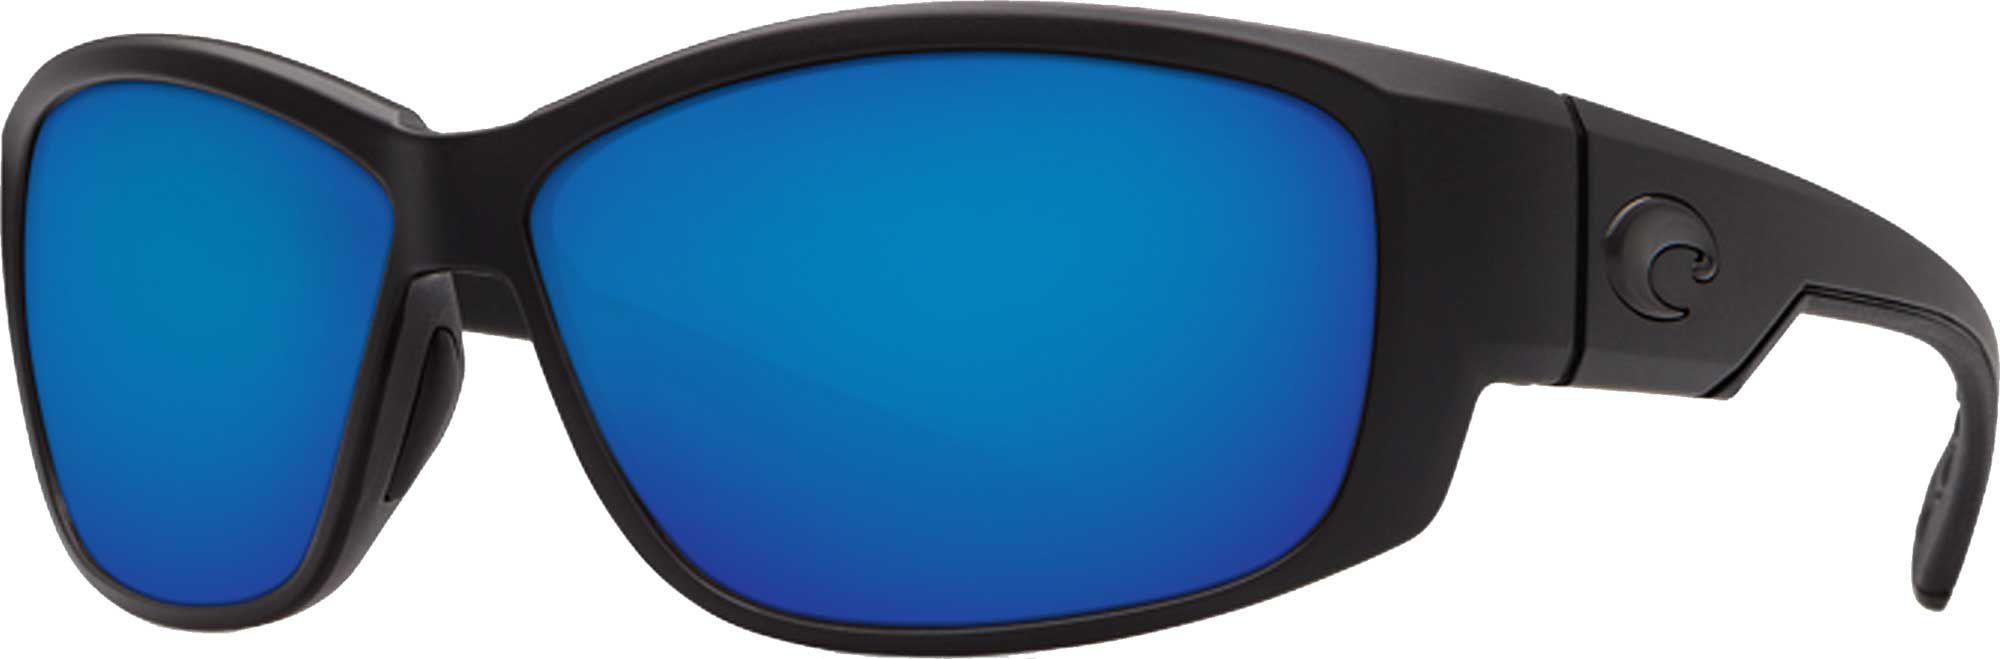 Costa Del Mar Men's Luke 400G Polarized Sunglasses [Dick's Sporting Goods] $99